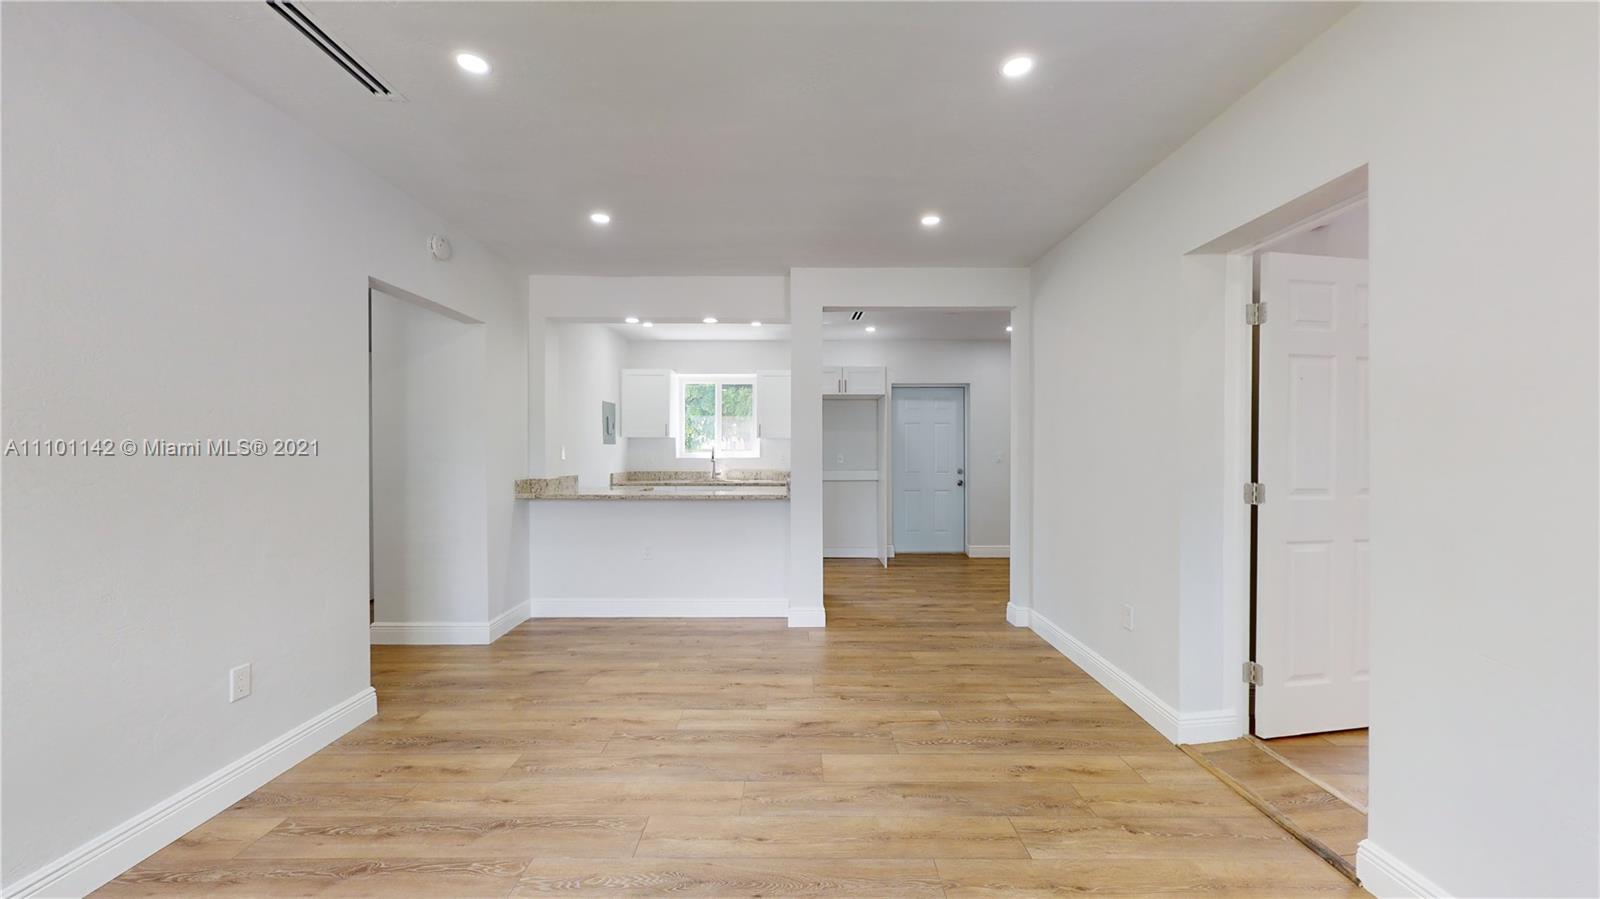 Single Family Home For Sale ARCOLA GARDENS1,111 Sqft